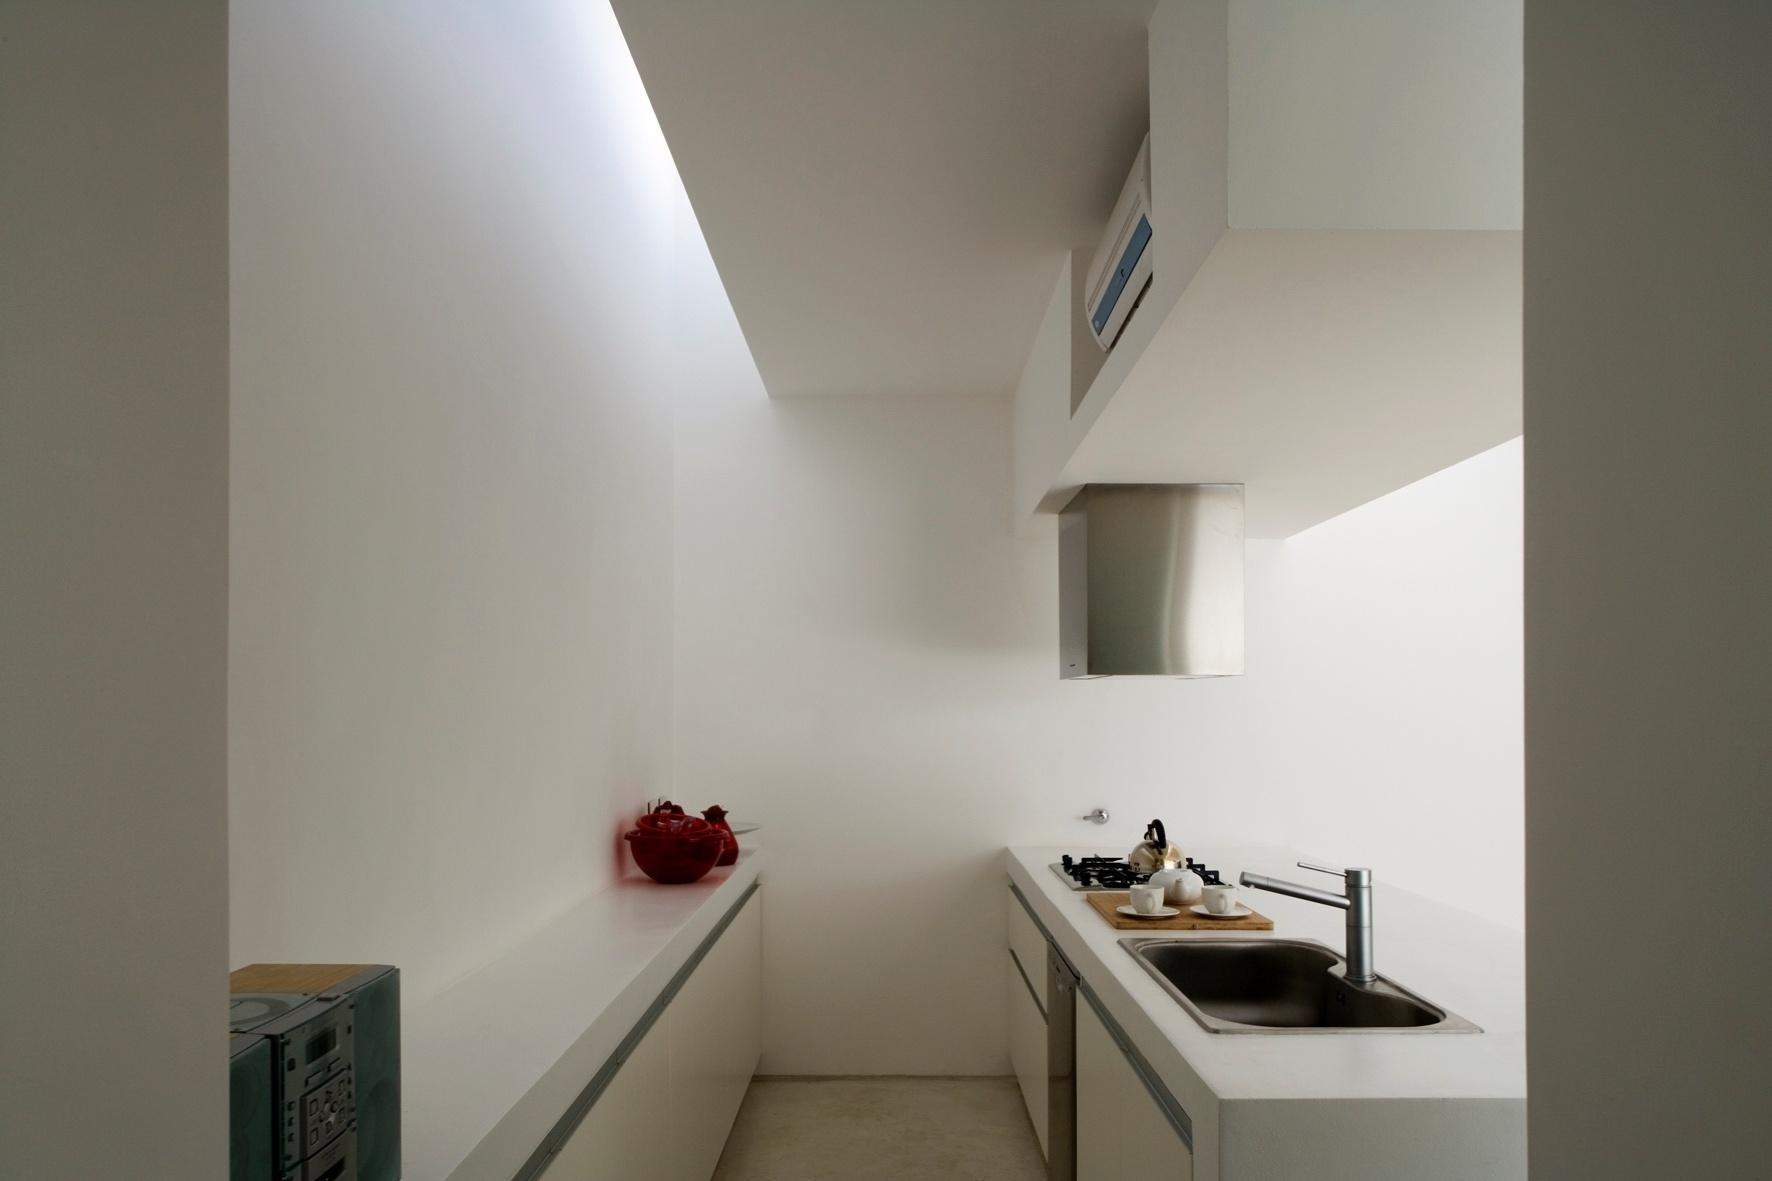 Os arquitetos Juan Germán Guardati, Román Renzi e Virginia Kahanoff gostam de dizer que o elemento predominante na Casa Caja - ou Patio - é